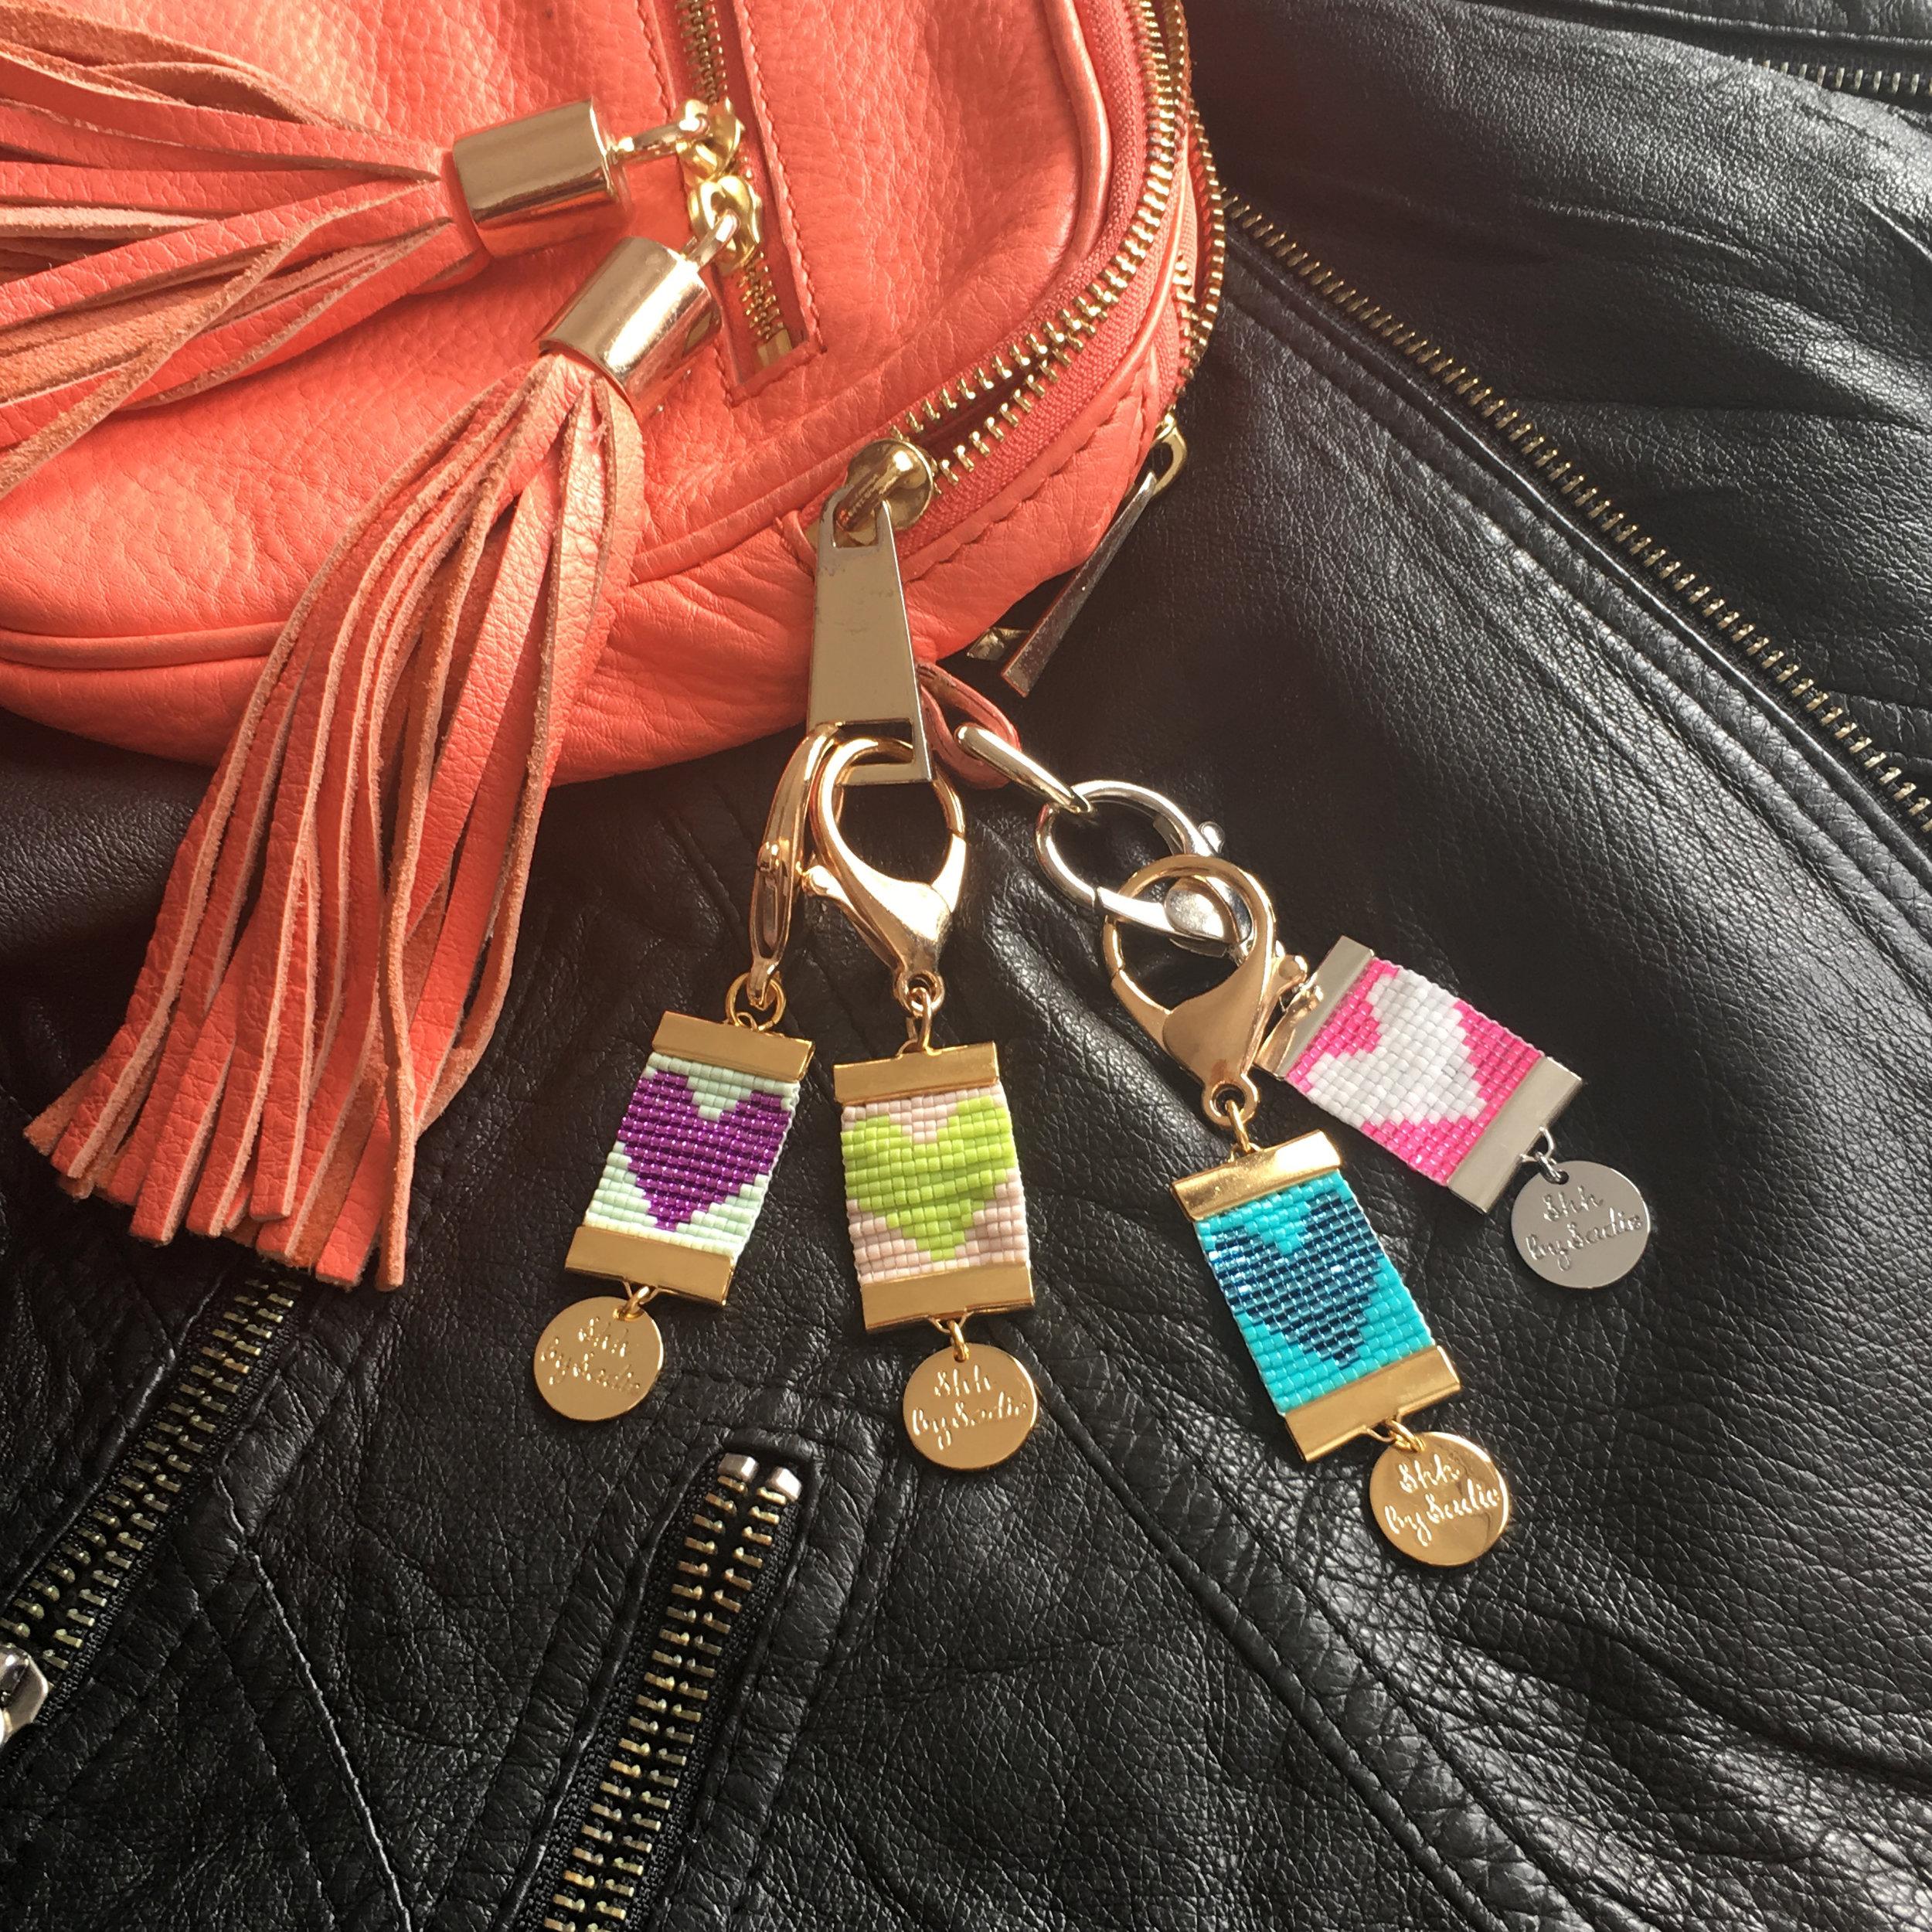 Designer bag charms by British jewellery designer shh by sadie